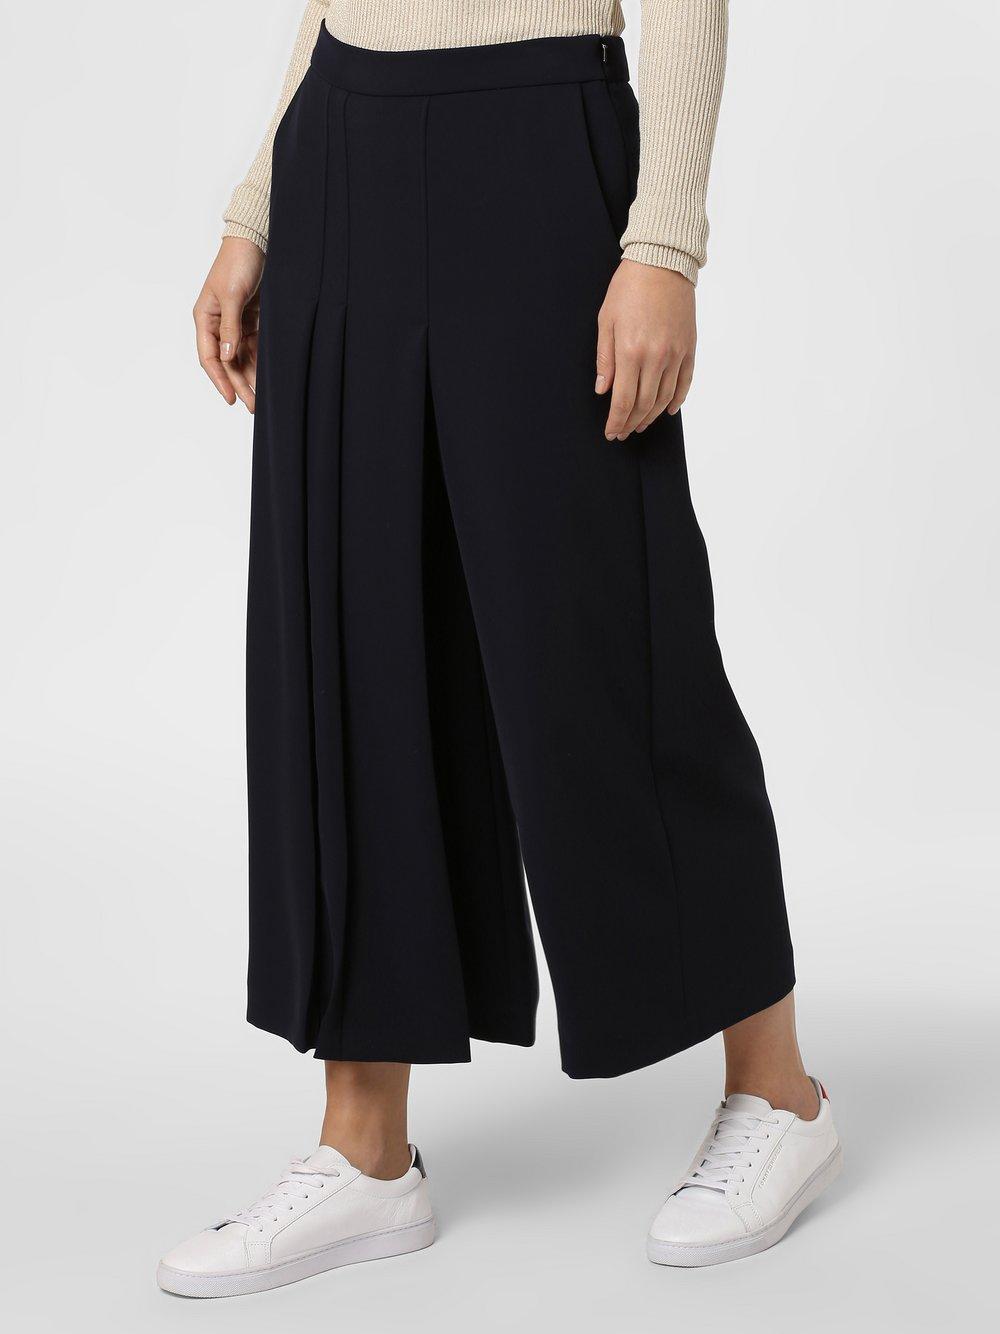 RAFFAELLO ROSSI – Spodnie damskie – Agnetha, niebieski Van Graaf 458446-0001-00360